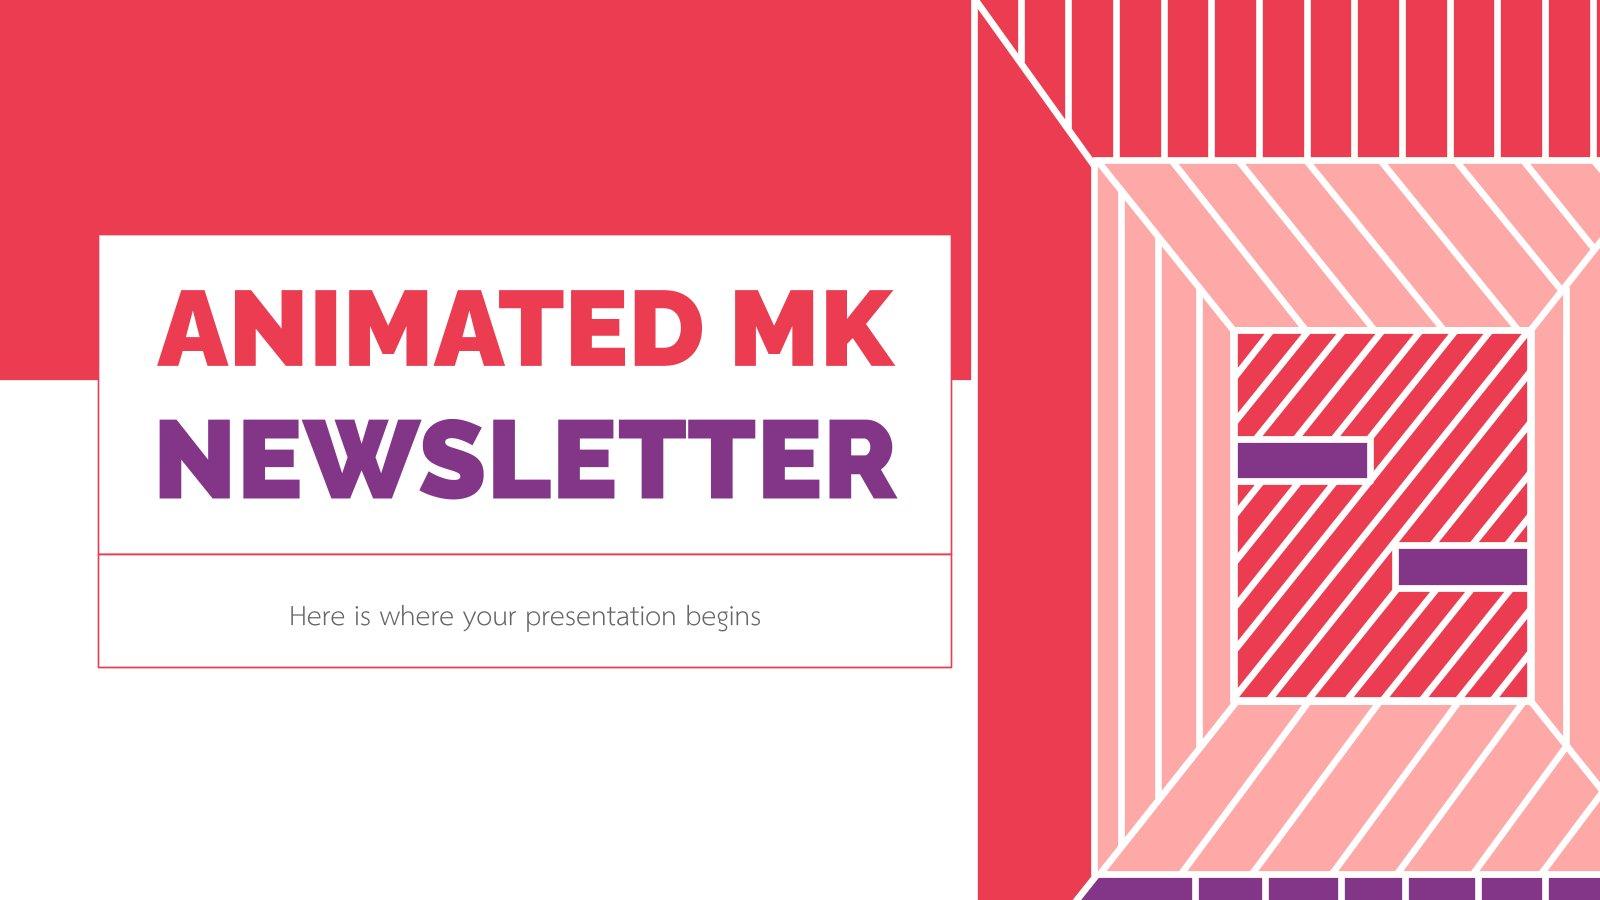 Animated MK Newsletter presentation template